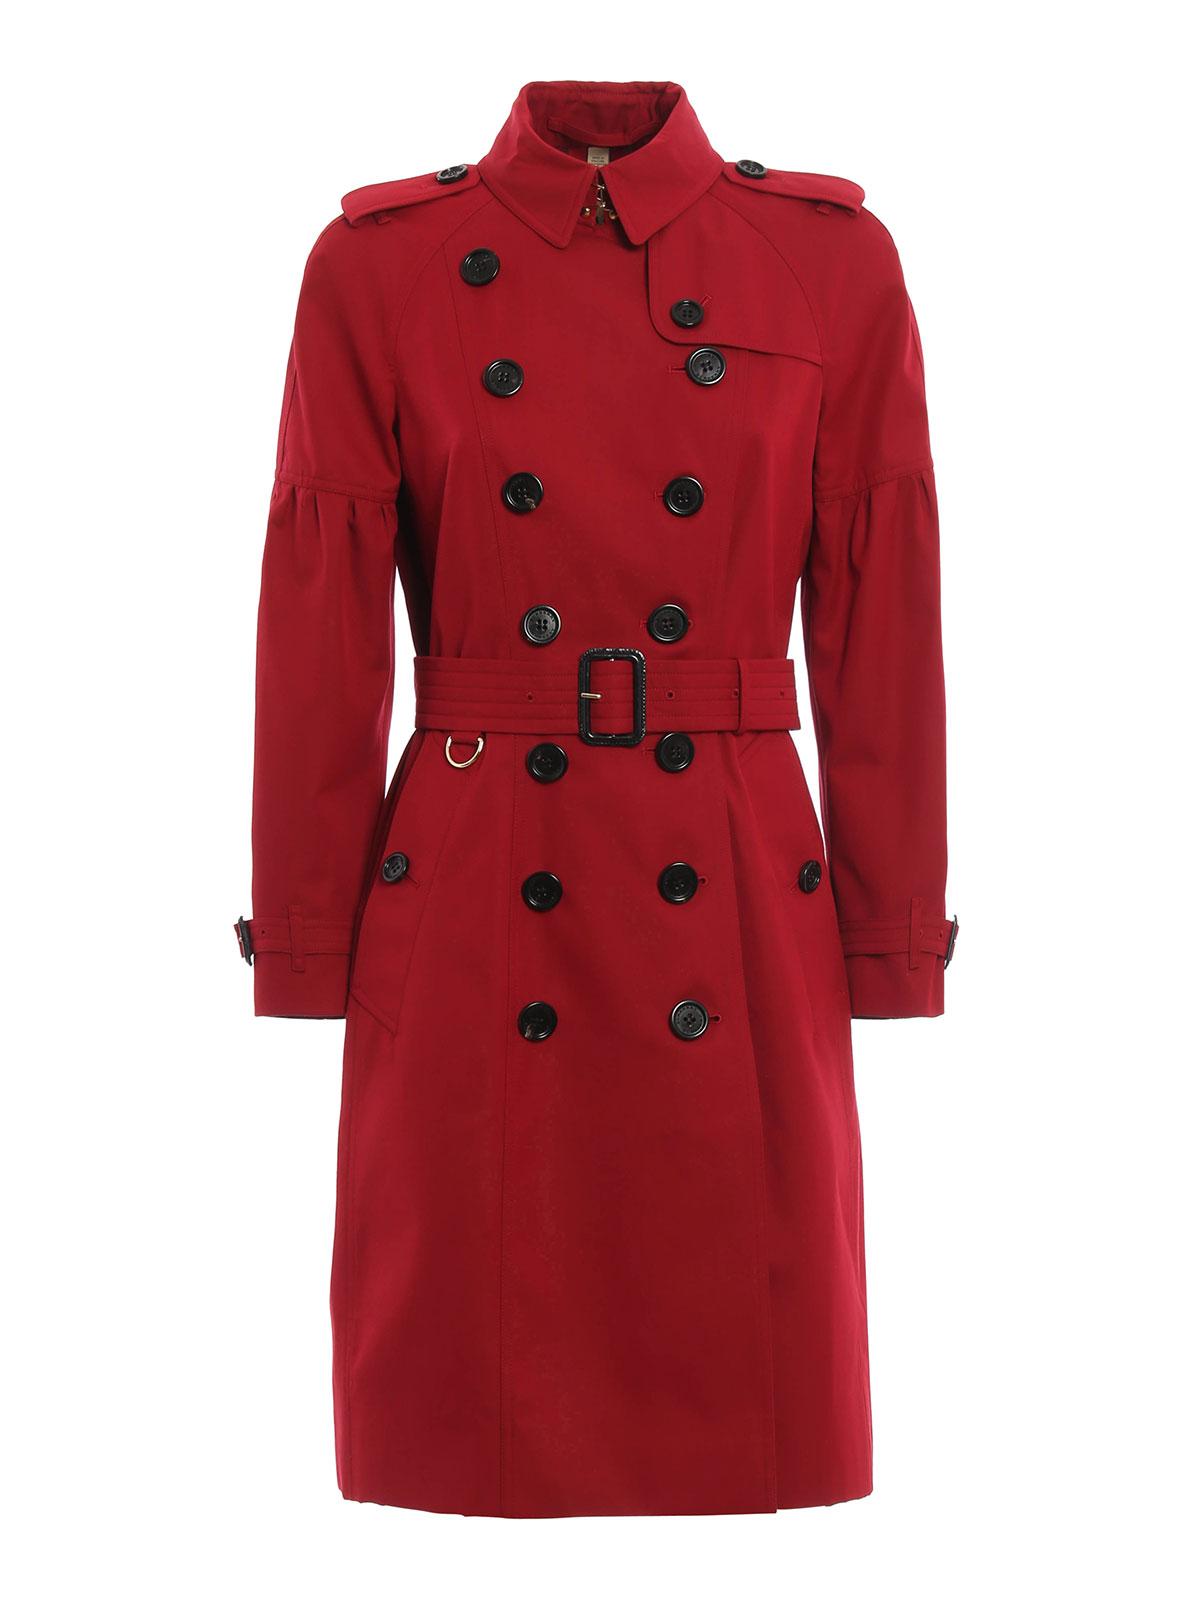 f86dceff5cb71 Burberry - Gabardina Roja Para Mujer - gabardinas - 4043804